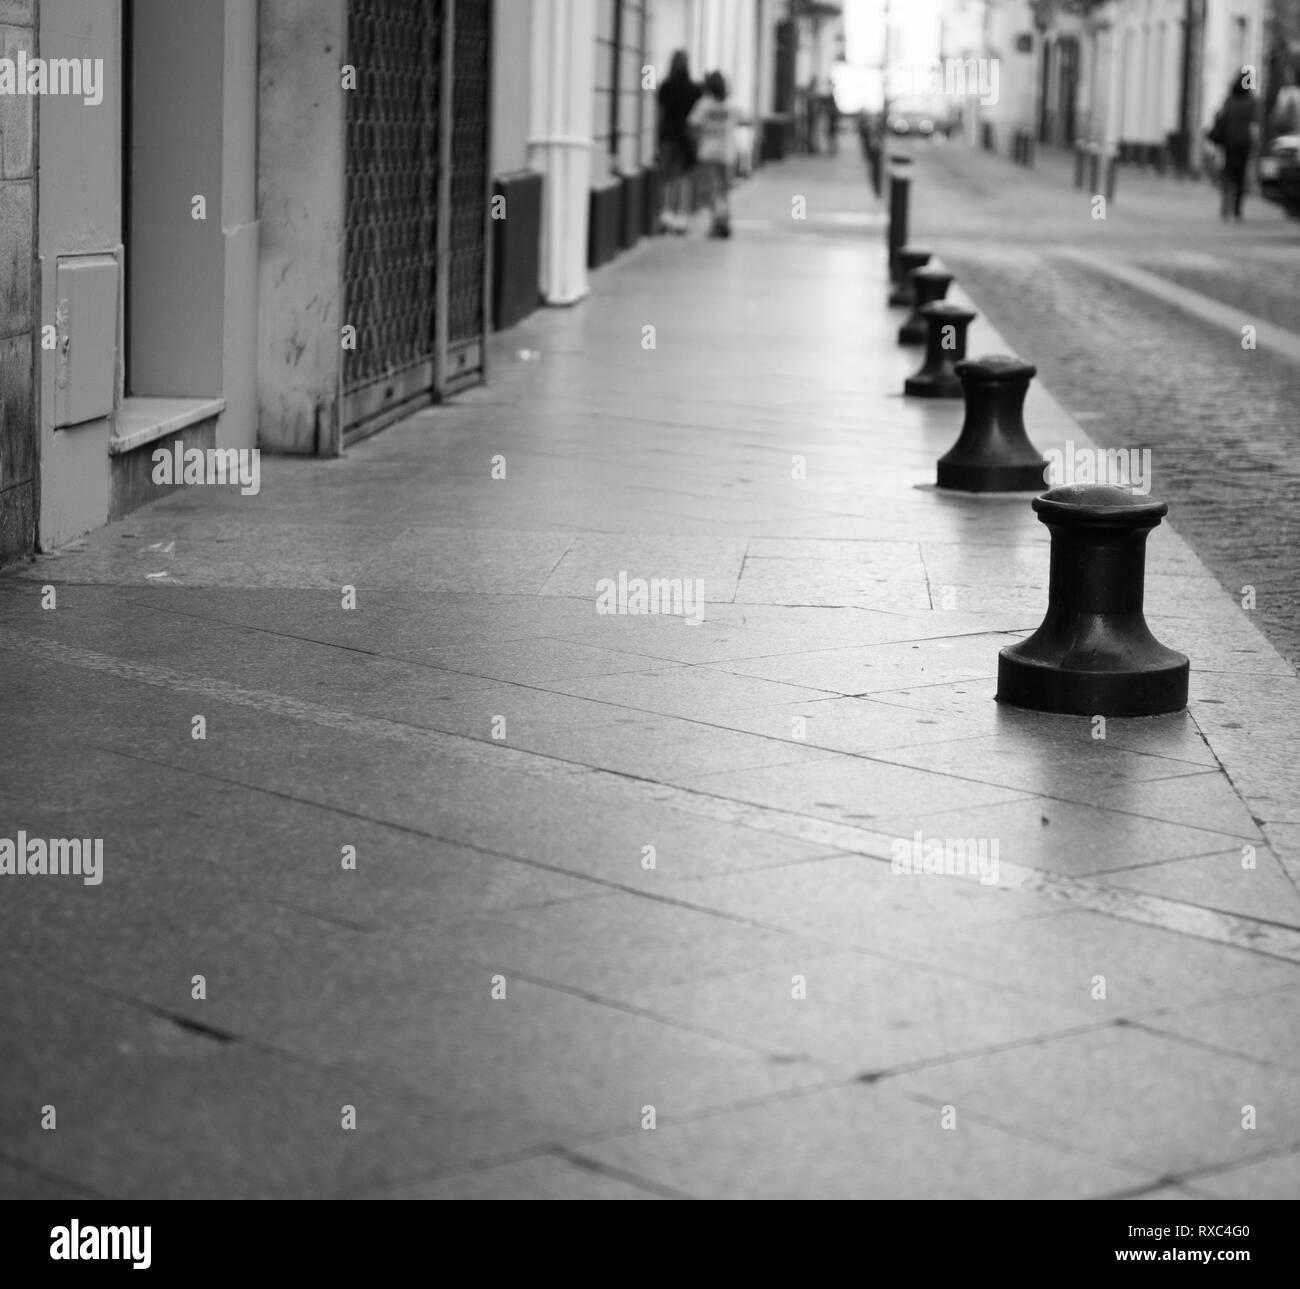 Line of metal bollards marking the pavement edge in an empty street.   distant unidentifiable figure add scale, Street furniture bollard - Stock Image